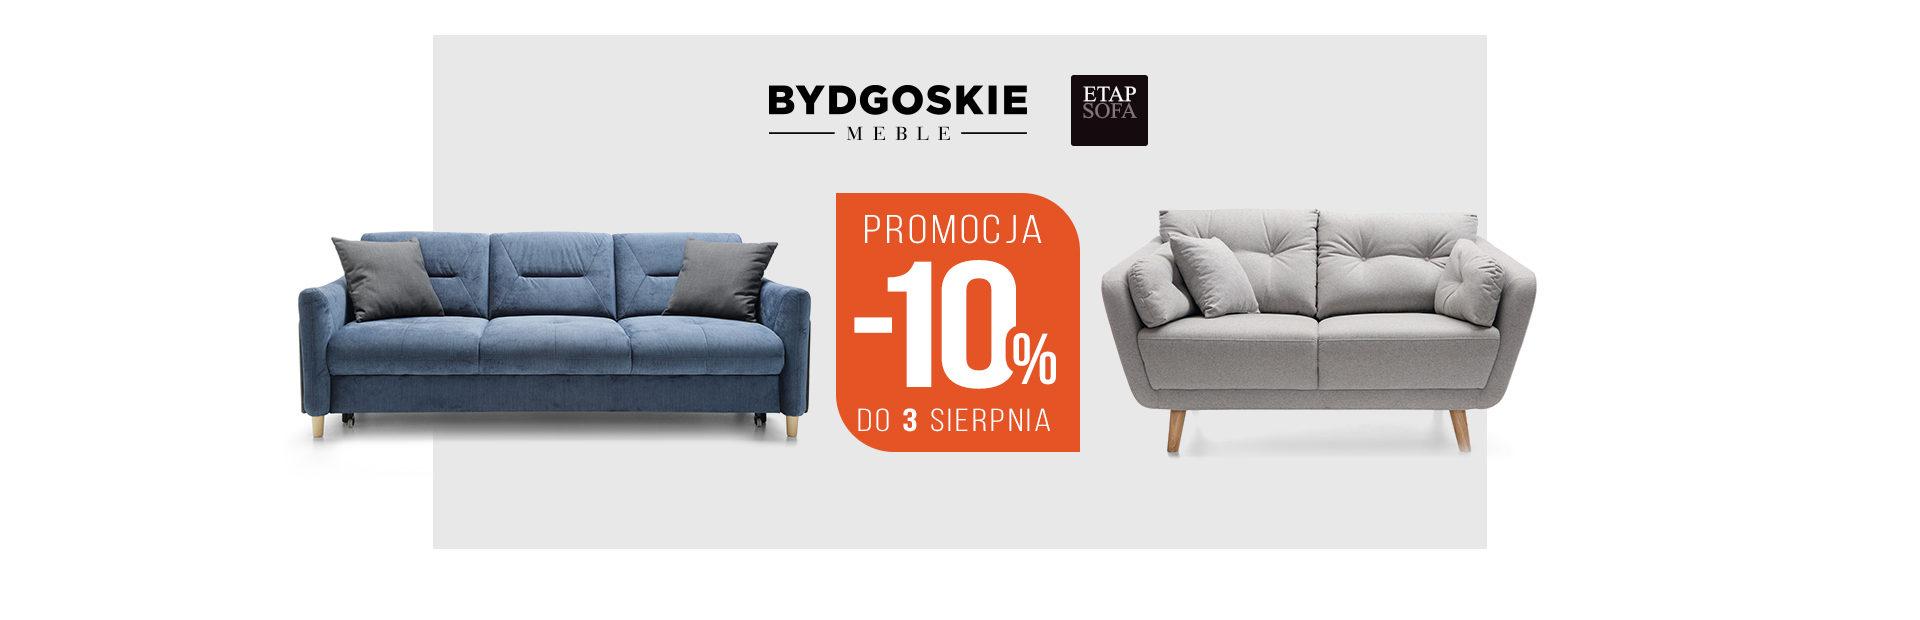 Etap Sofa i Bydgoskie